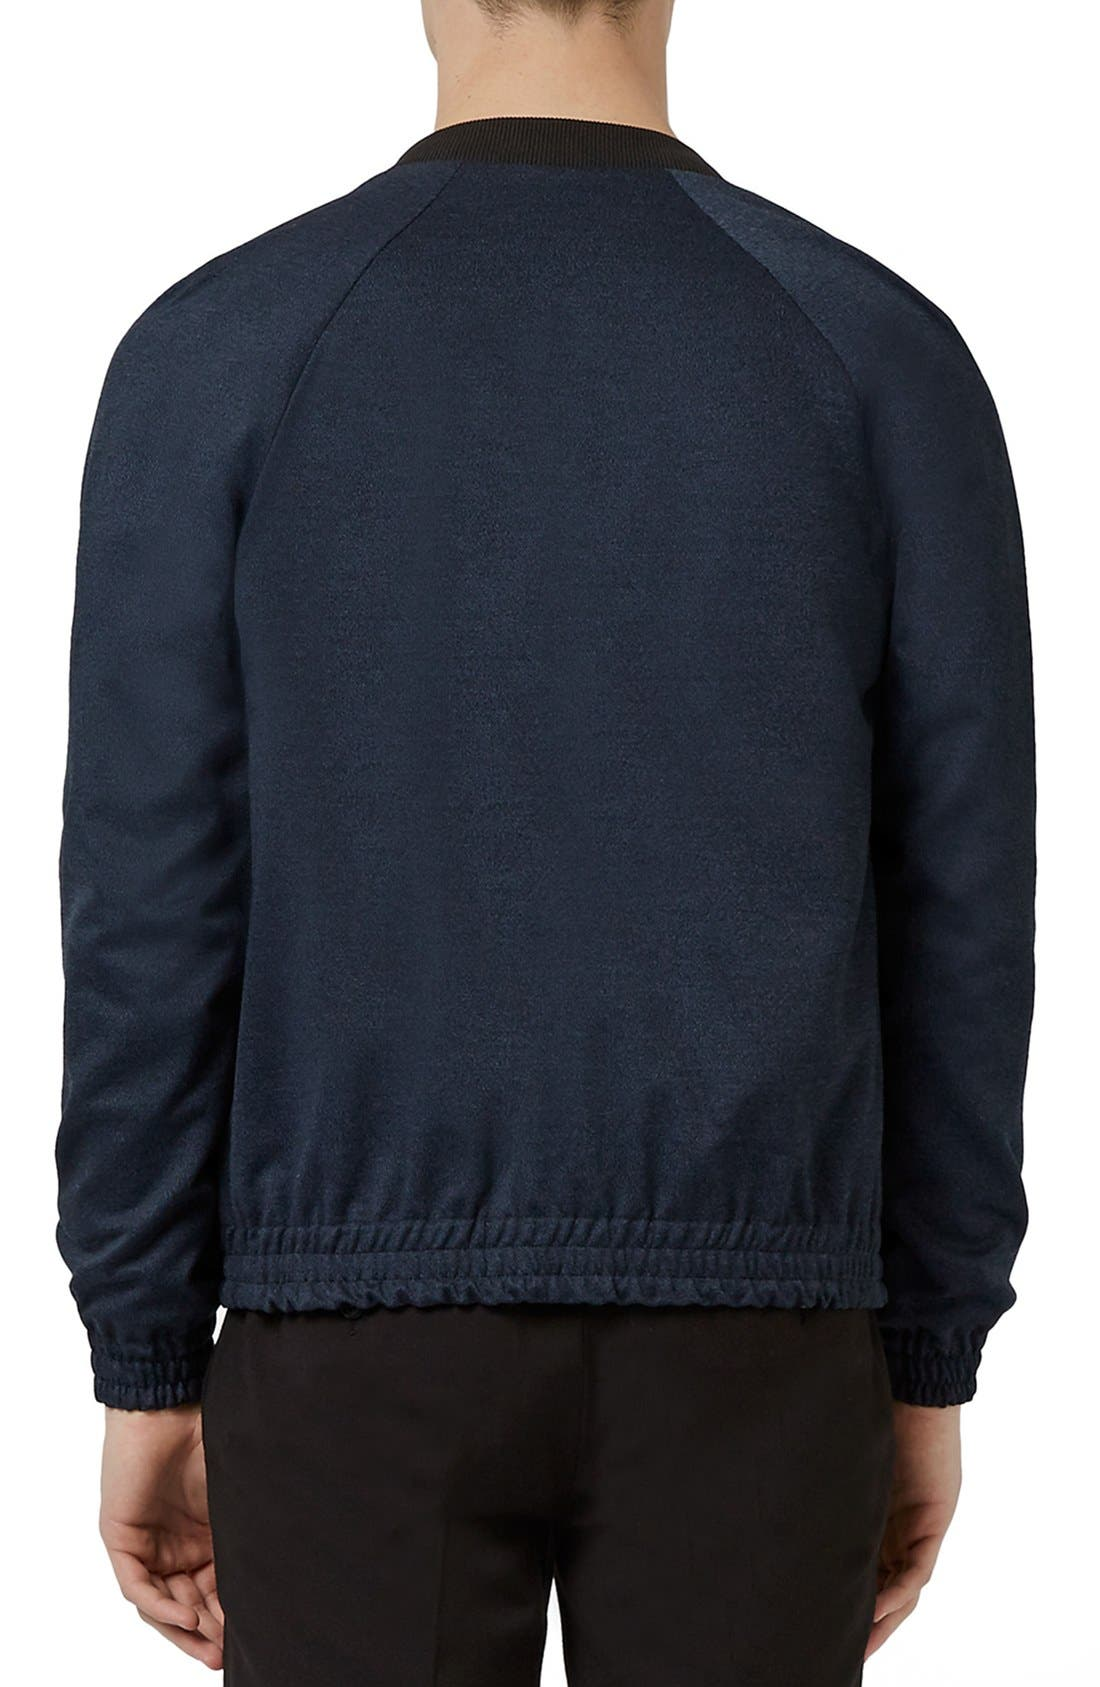 TOPMAN,                             Tailored Fit Raglan Bomber Jacket,                             Alternate thumbnail 4, color,                             410